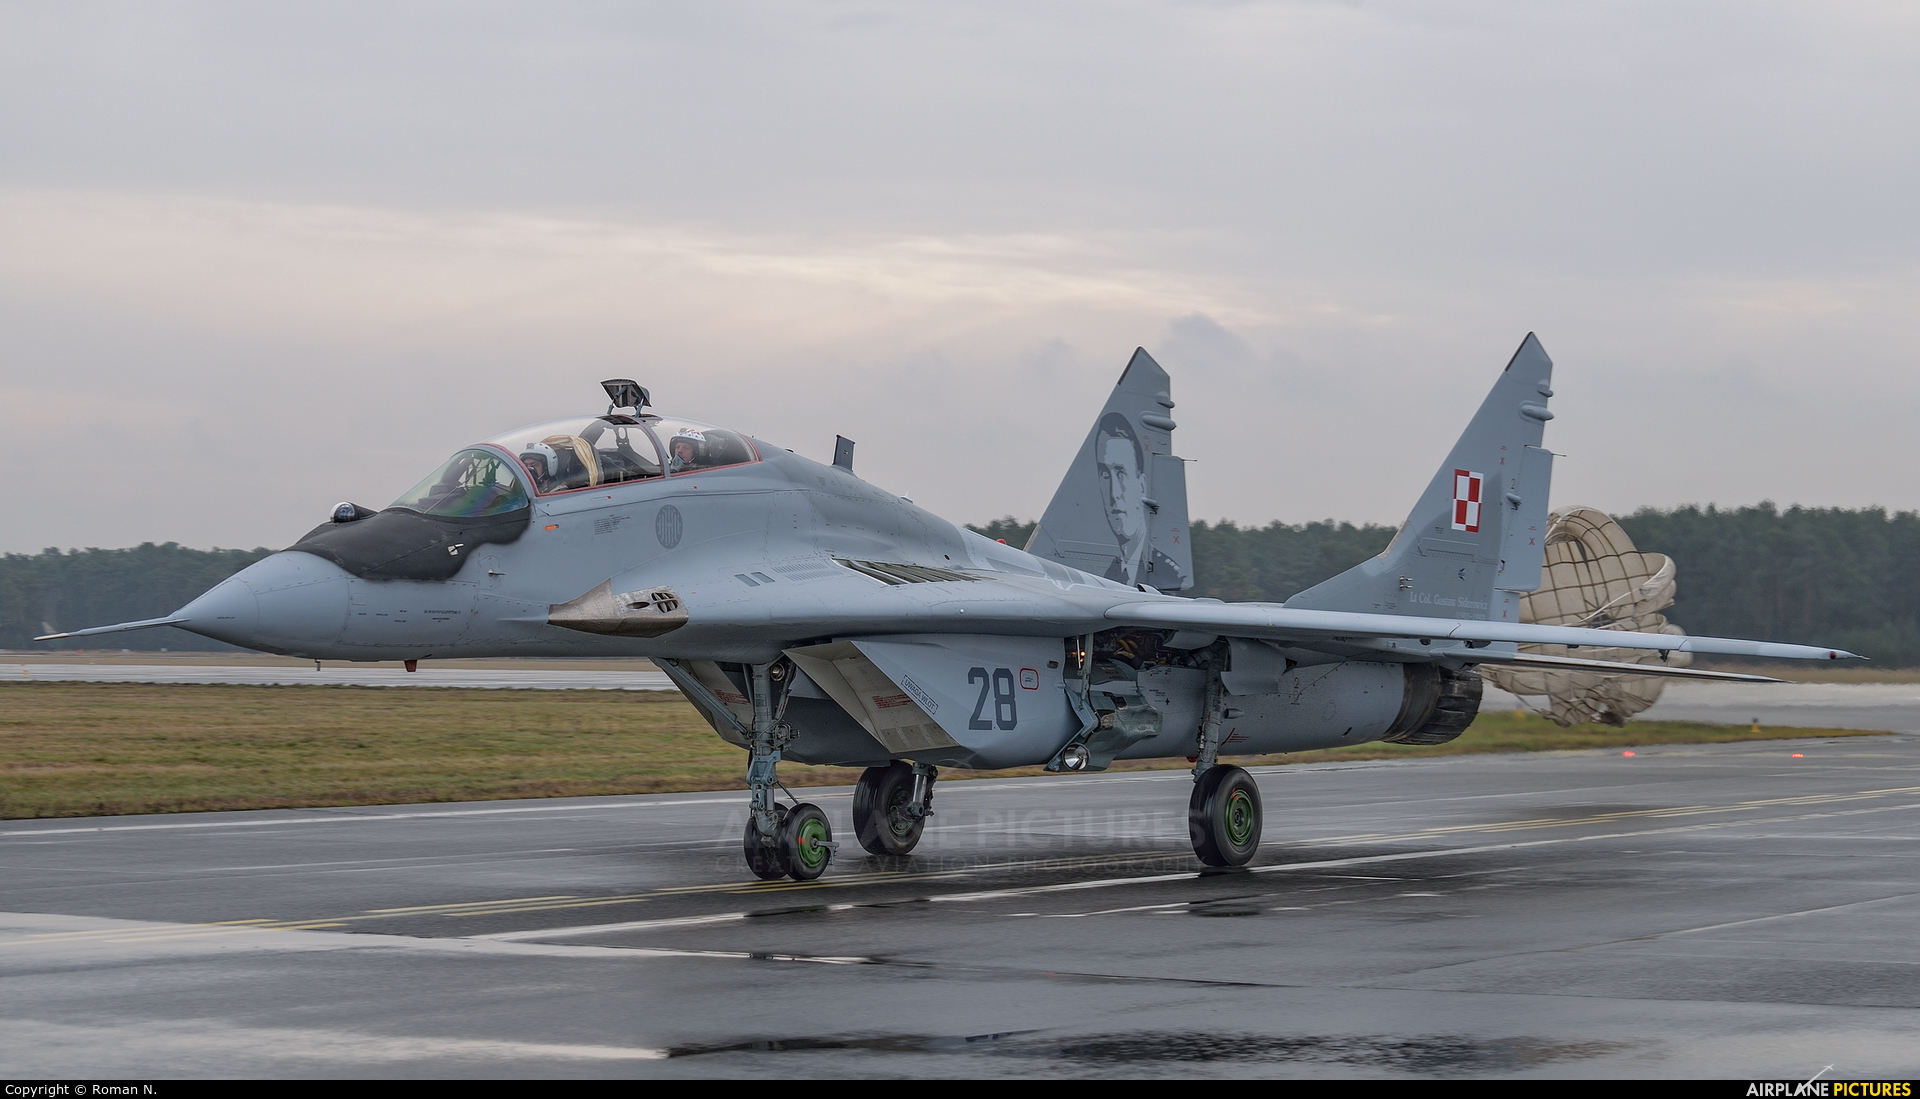 Poland - Air Force 28 aircraft at Bydgoszcz - Szwederowo